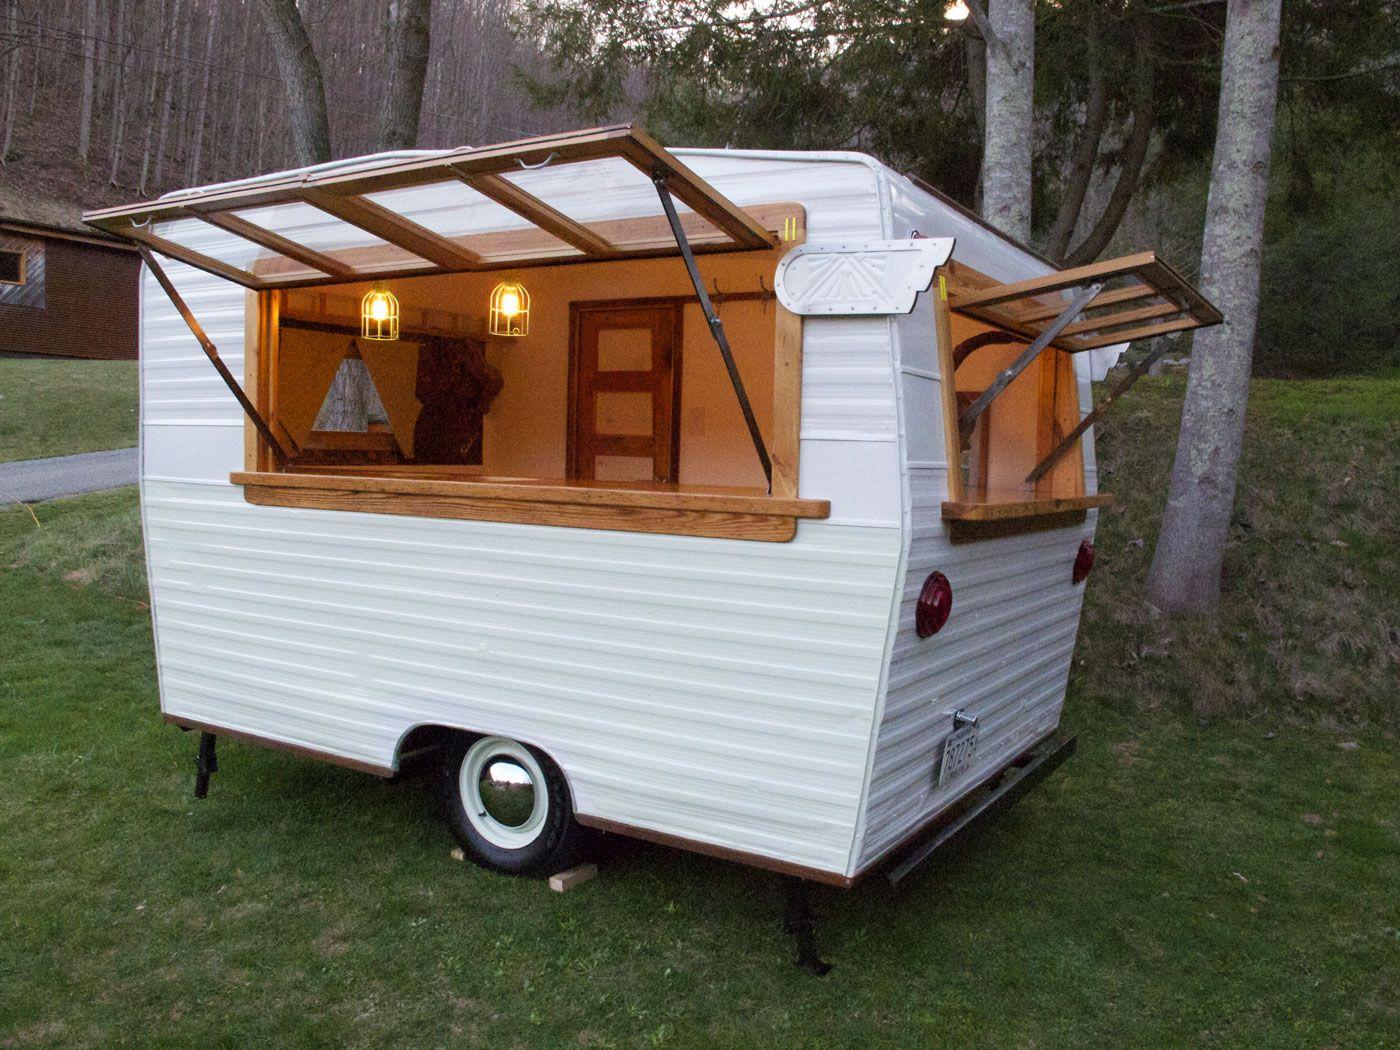 Camp Cocktail Shasta Camper Caravan Bar Caravan Bar Food Truck Mobile Coffee Shop